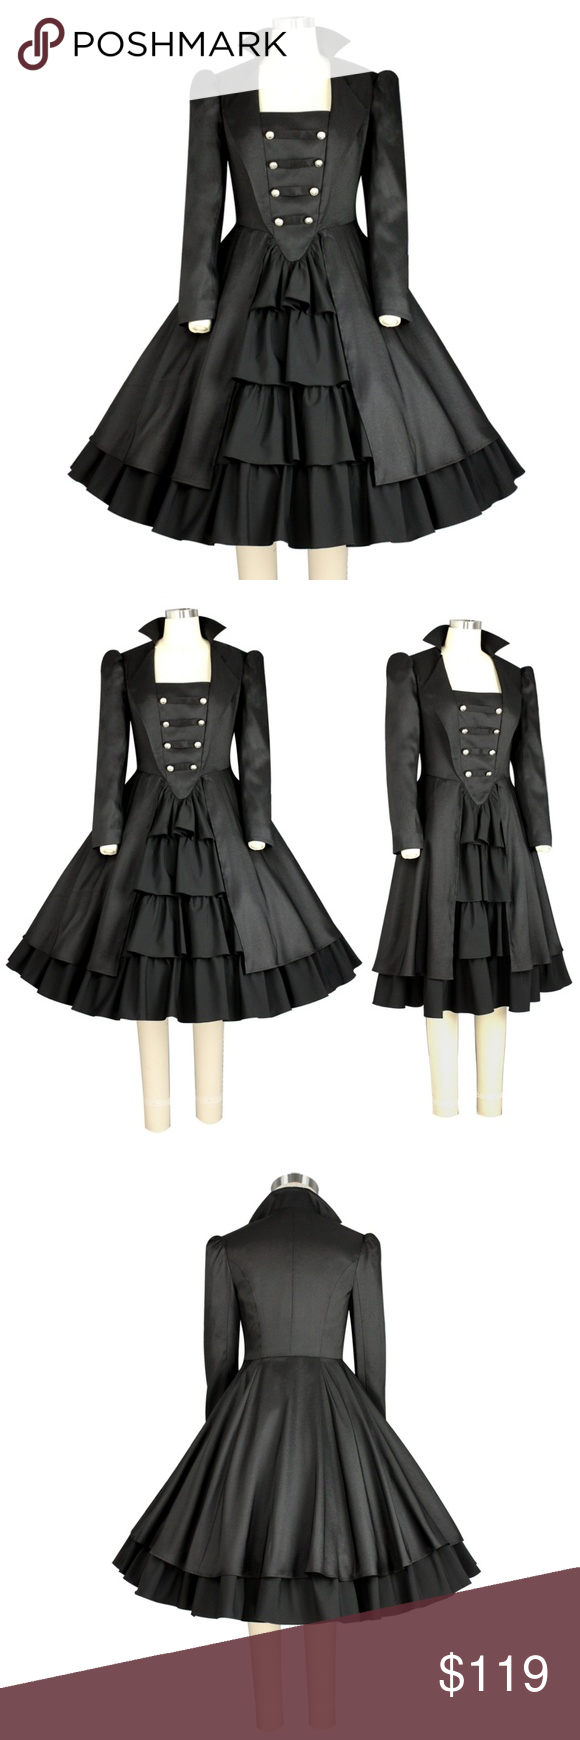 I just added this listing on poshmark new long sleeve ruffle dress